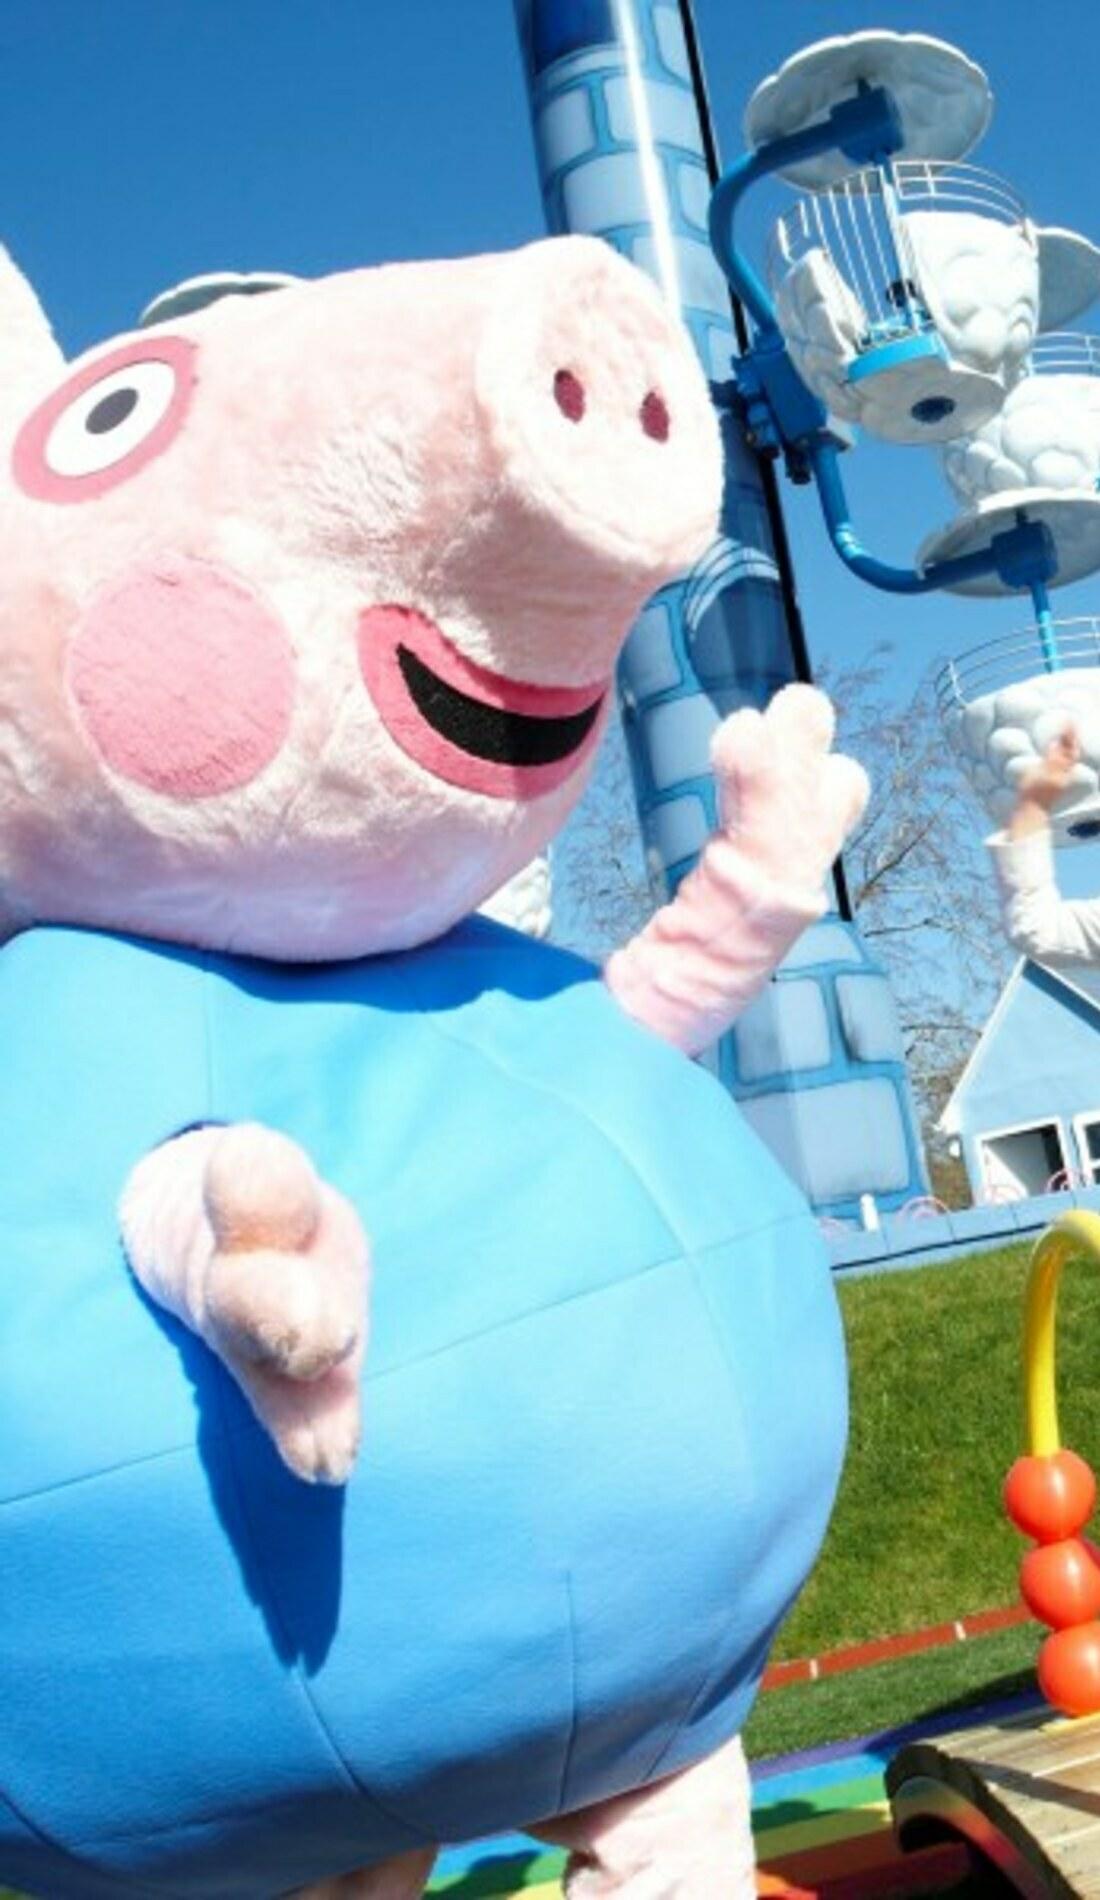 A Peppa Pig live event